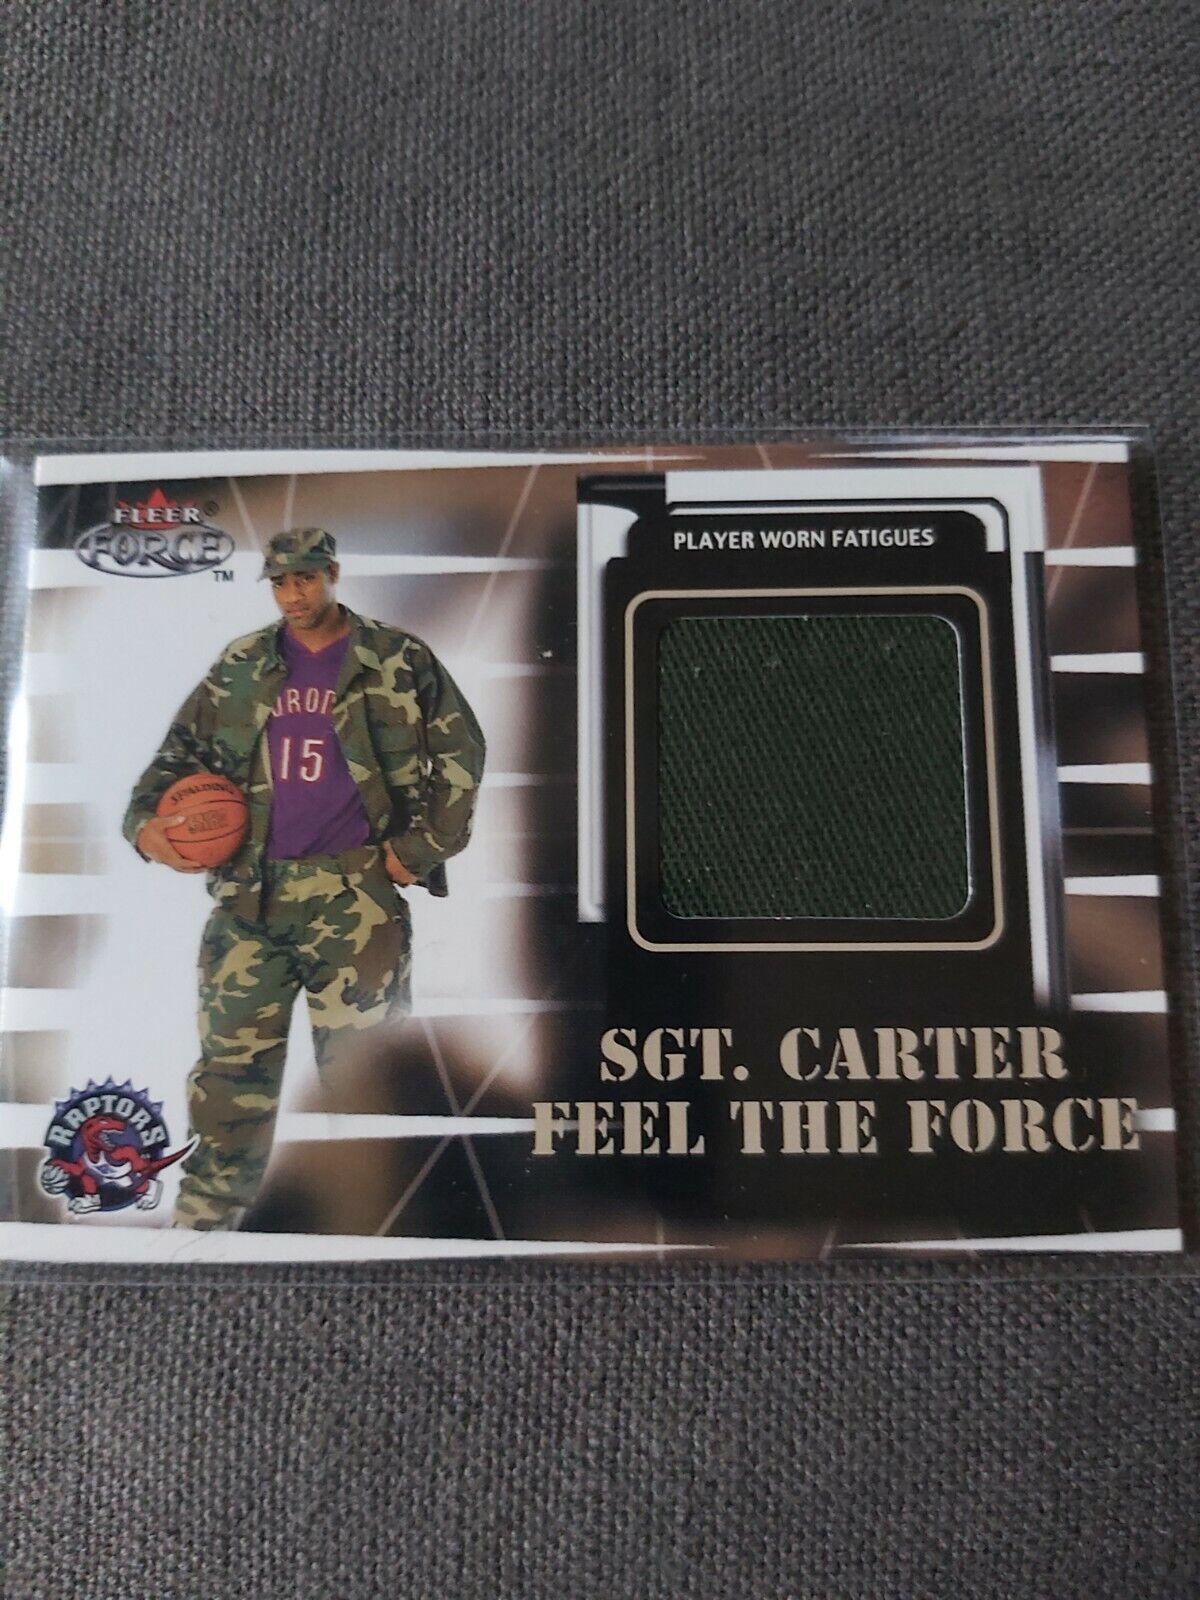 Fleer force 99/00 sergent carter jersey